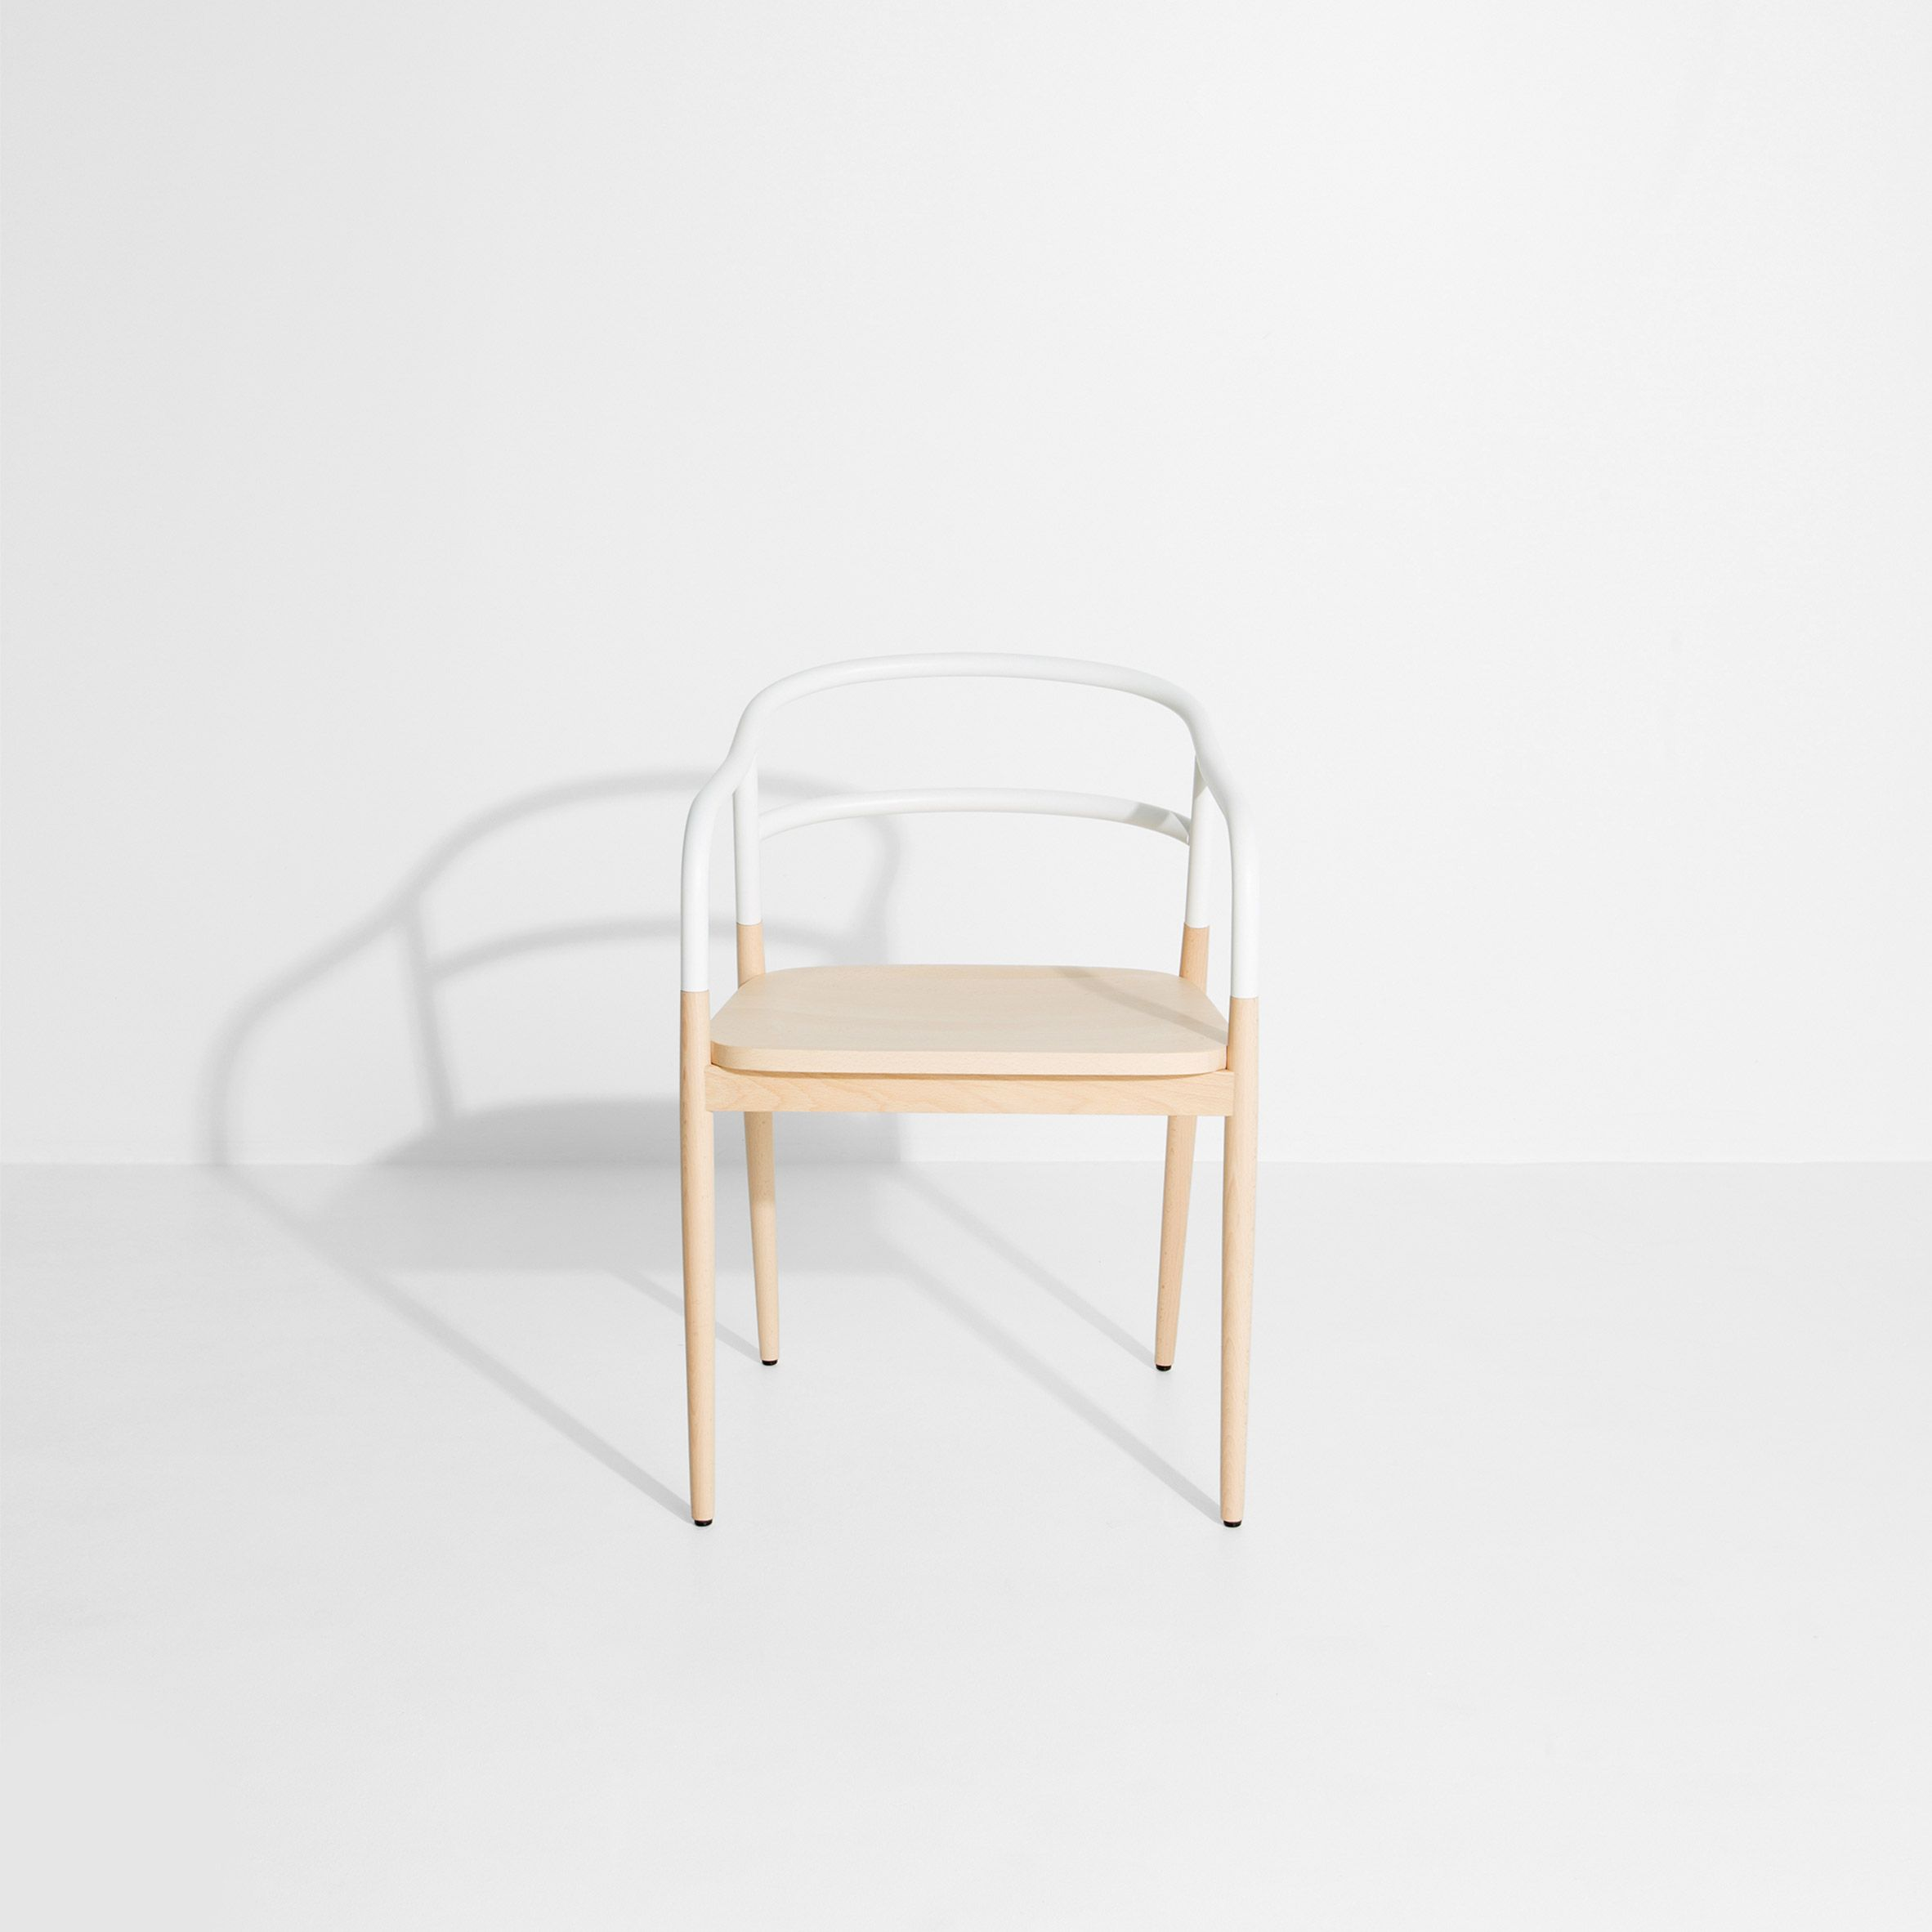 ac al studio creates martial arts inspired table and chair set rh pinterest com